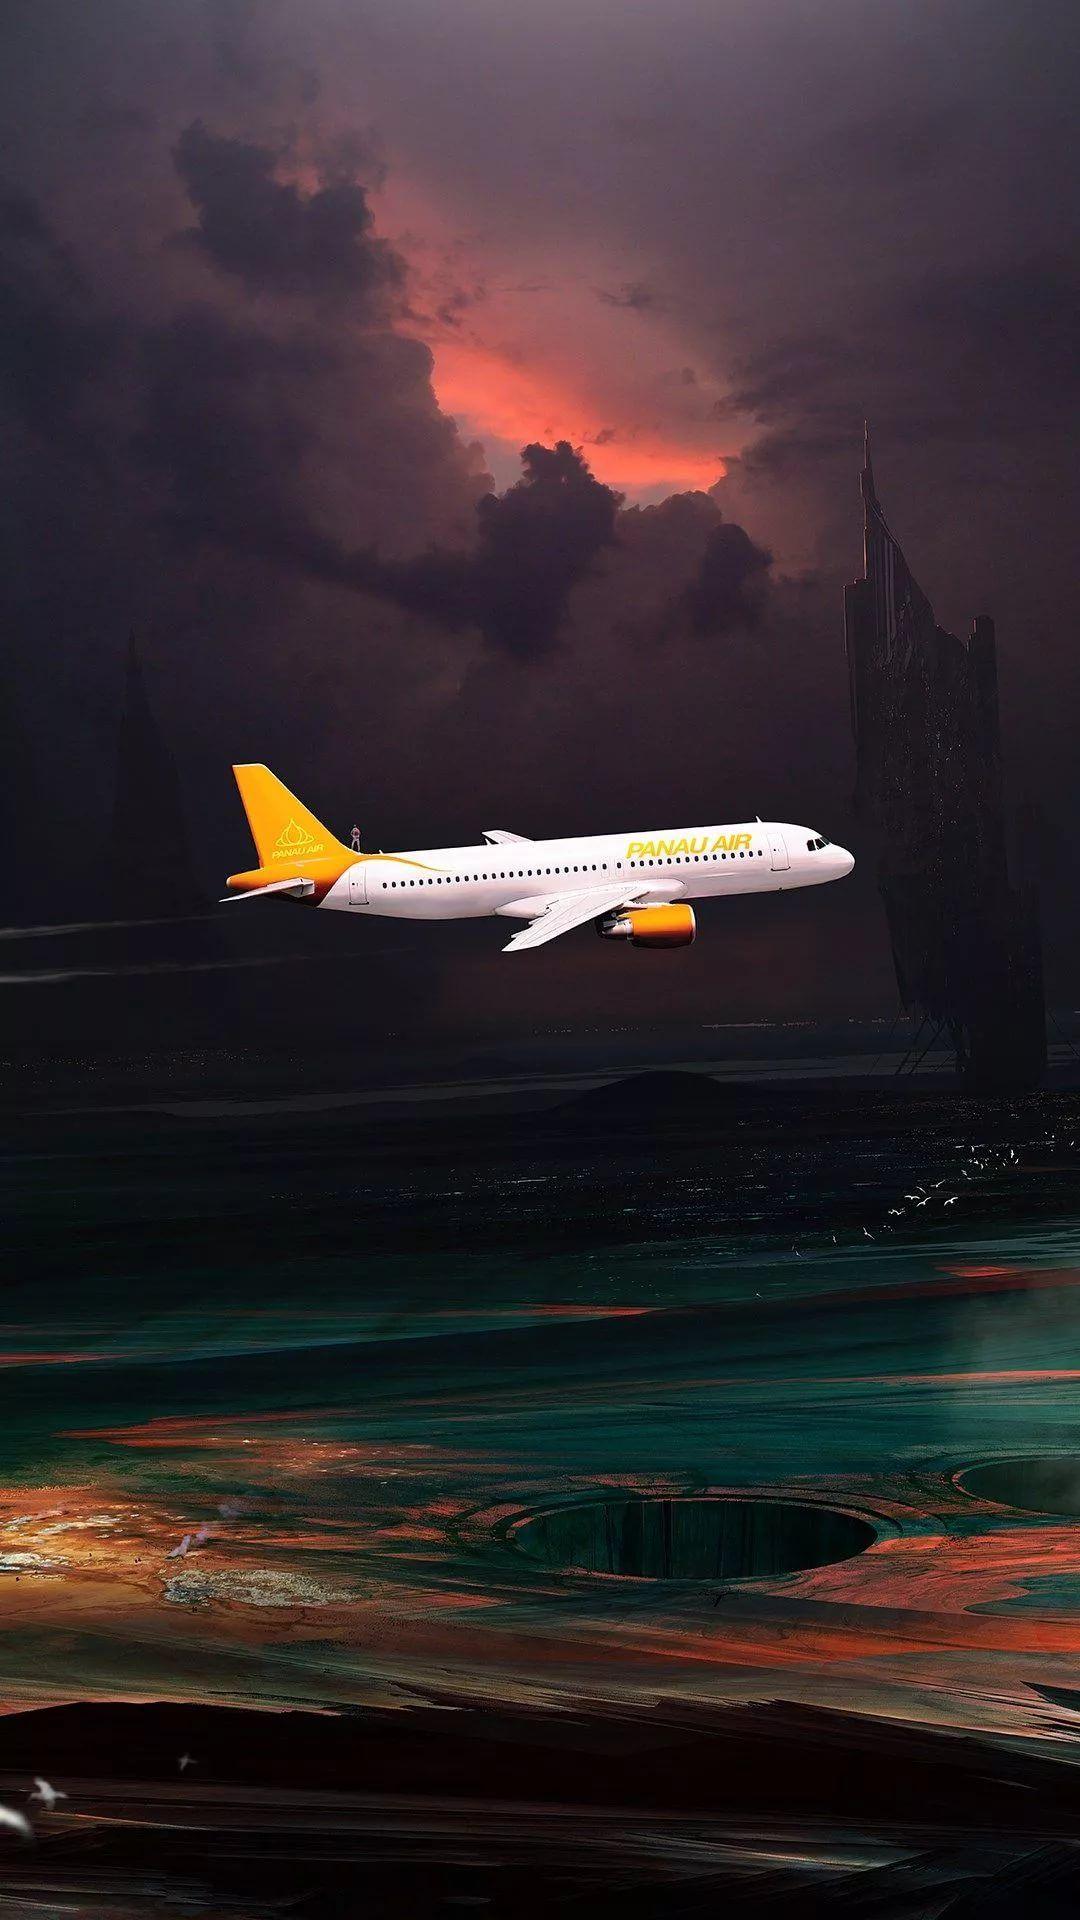 Airplane Samsung Galaxy wallpaper